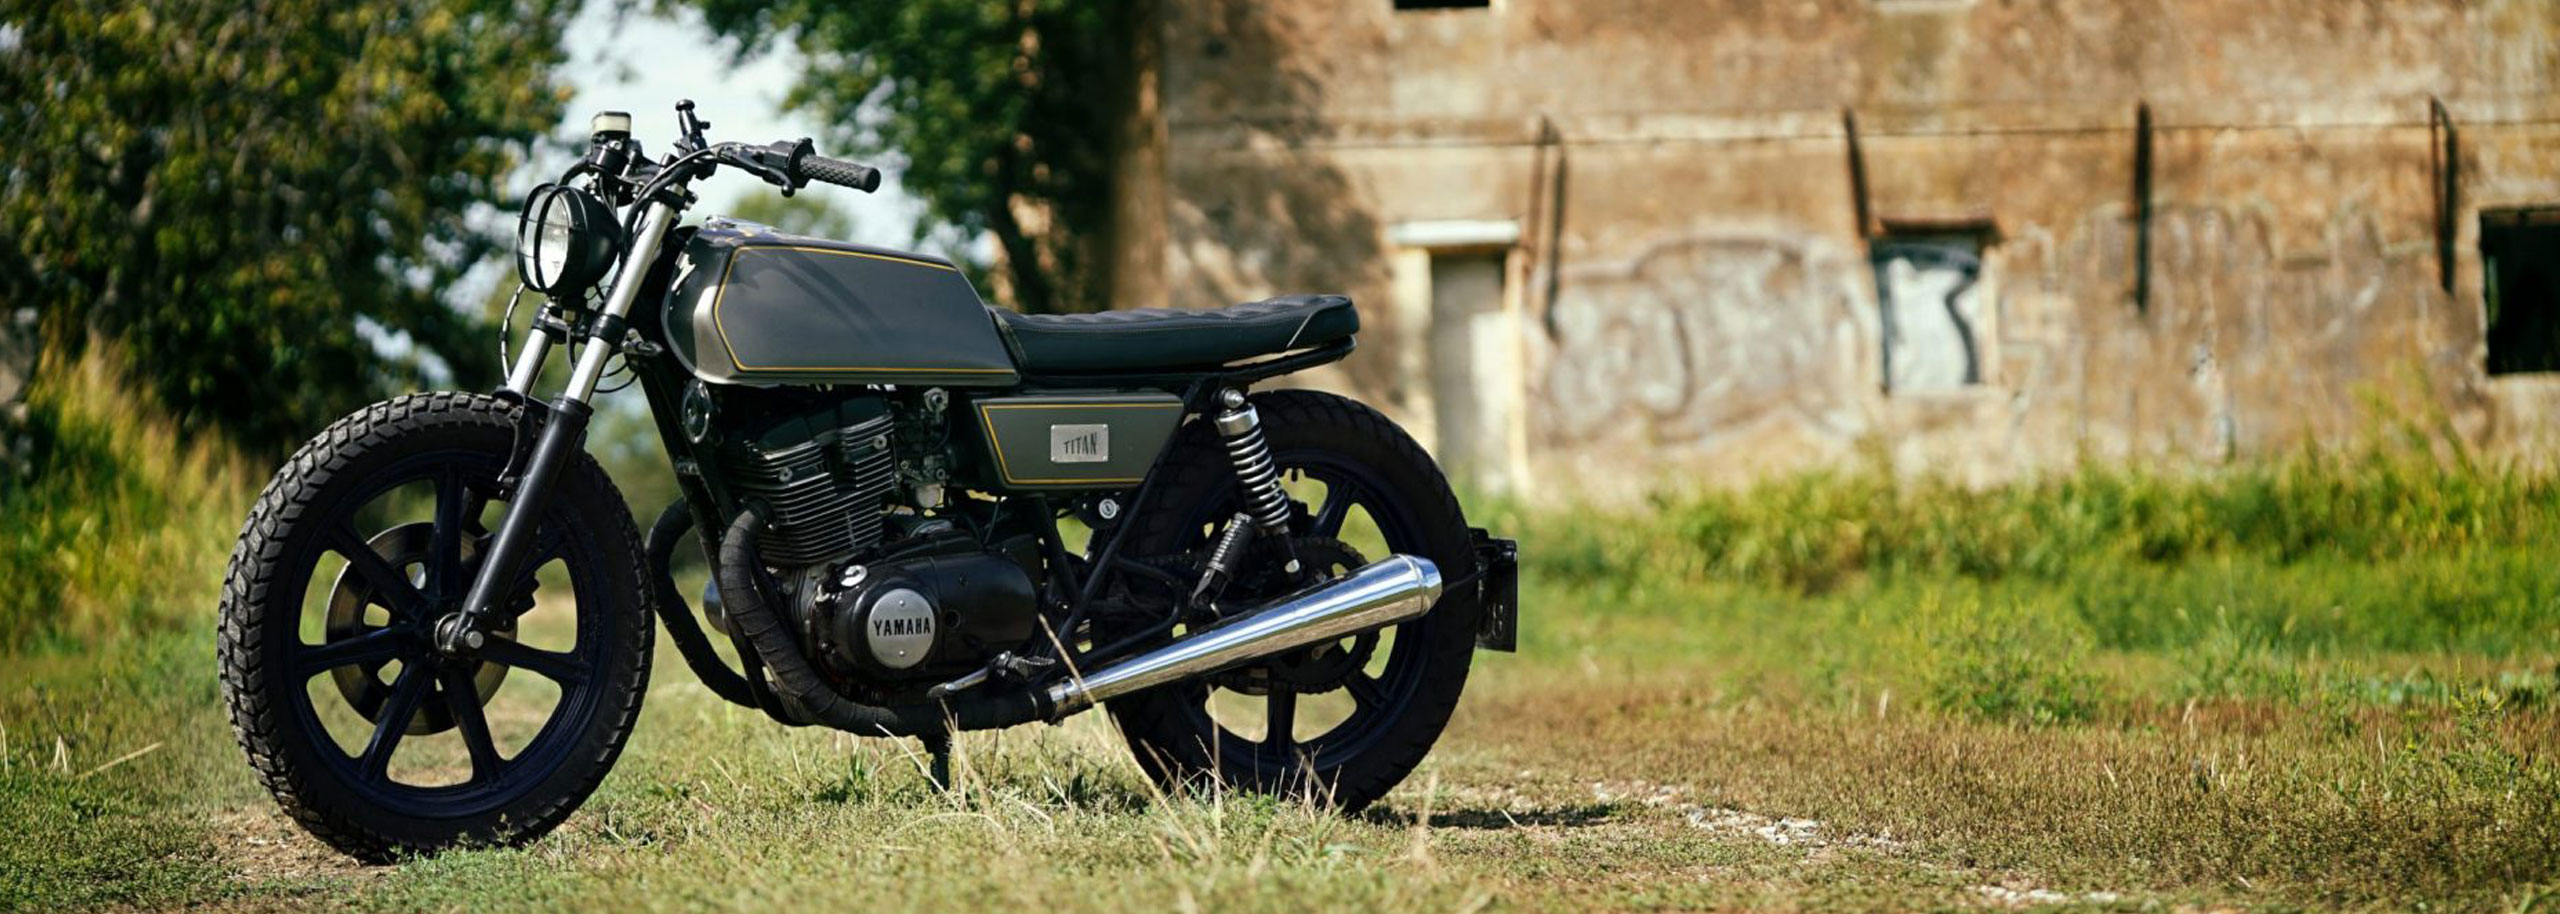 02_TITAN-Greek_Yamaha-Umbau-XS-500_Cafe-Racer-Graz-Motorrad-Umbau-Austria-Vintage_Custom-Bikes_Zweirad_Custom